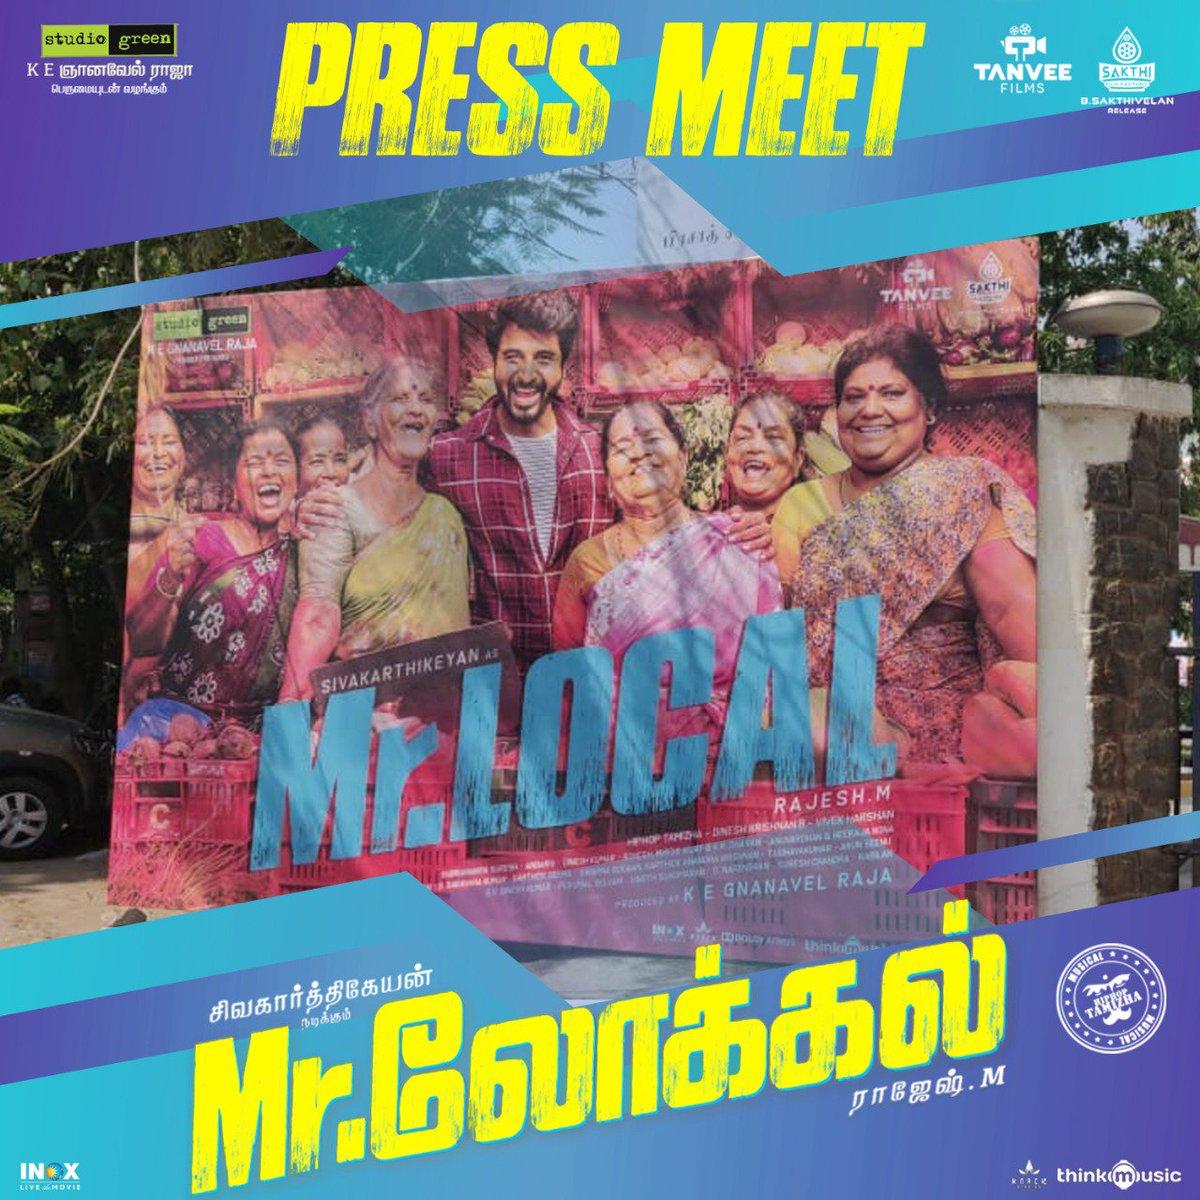 Much-awaited #MrLocalPressMeet is about to begin 😎  Stay-tuned to our handle for LIVE updates  #MrLocalin4Days #MrLocalOnMay17 😉Kalakkalu! Mr Local-lu! @Siva_Kartikeyan #Nayanthara @rajeshmdirector @hiphoptamizha @realradikaa @SF2_official @malikstreams @thinkmusicindia